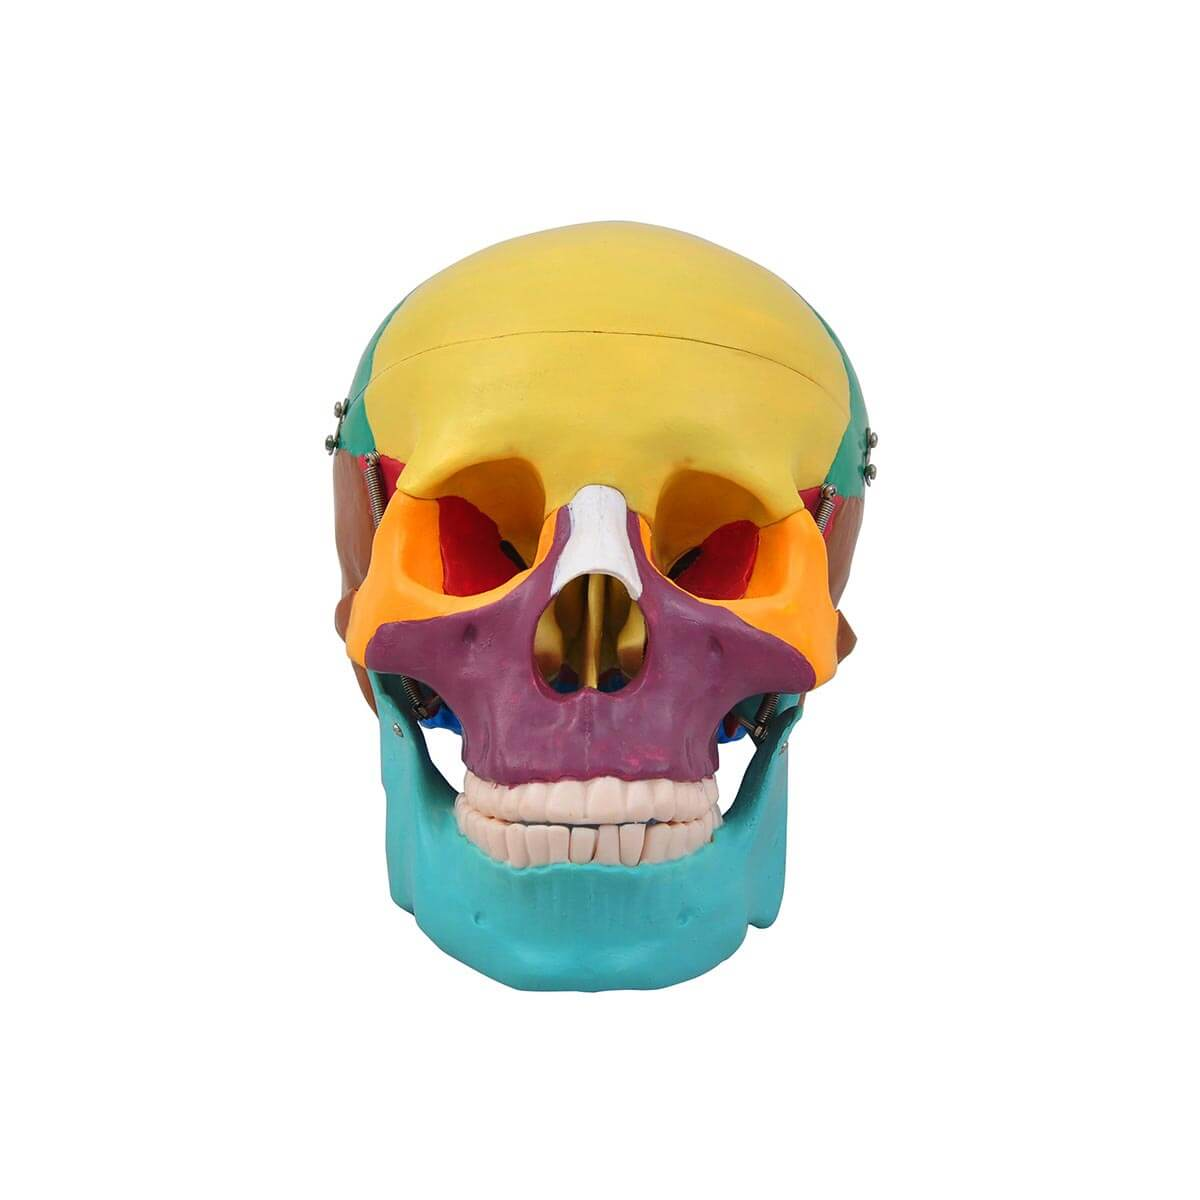 Cranio Humano Adulto Colorido Pvc Mandibula Movel Anatomia E Fisiologia